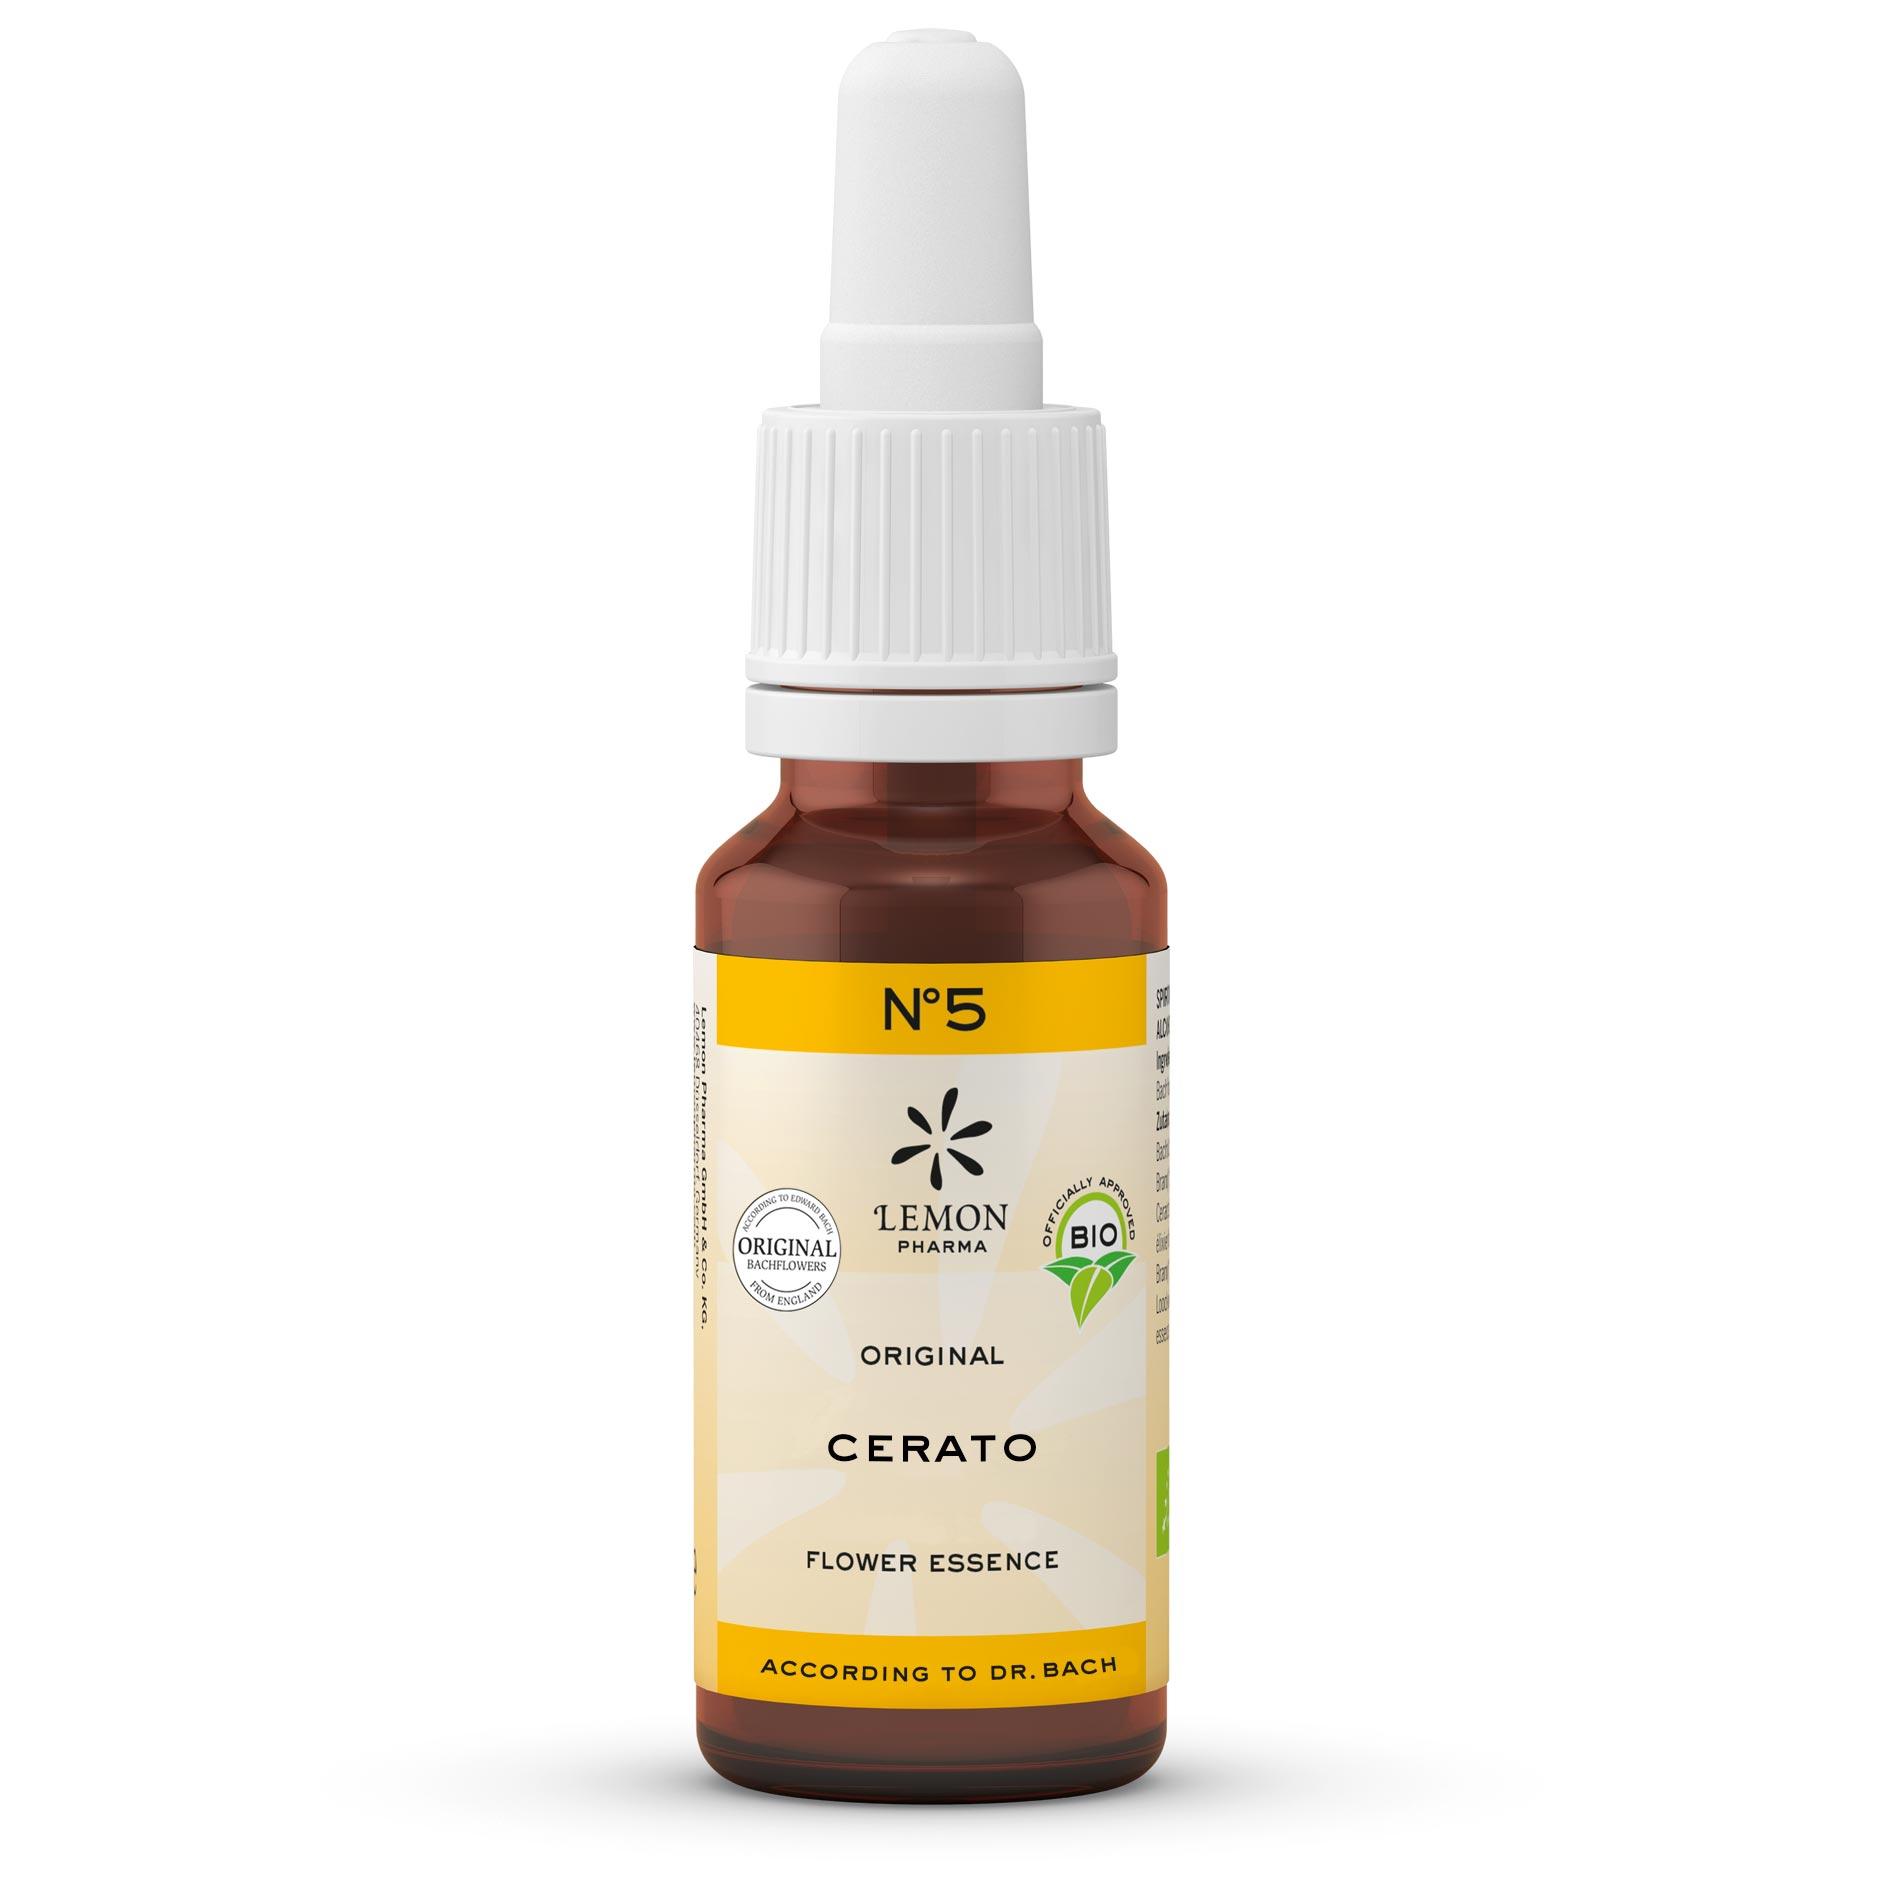 Lemon Pharma Original Bachblüten Tropfen Nr 5 Cerato Bleiwurz Intuition